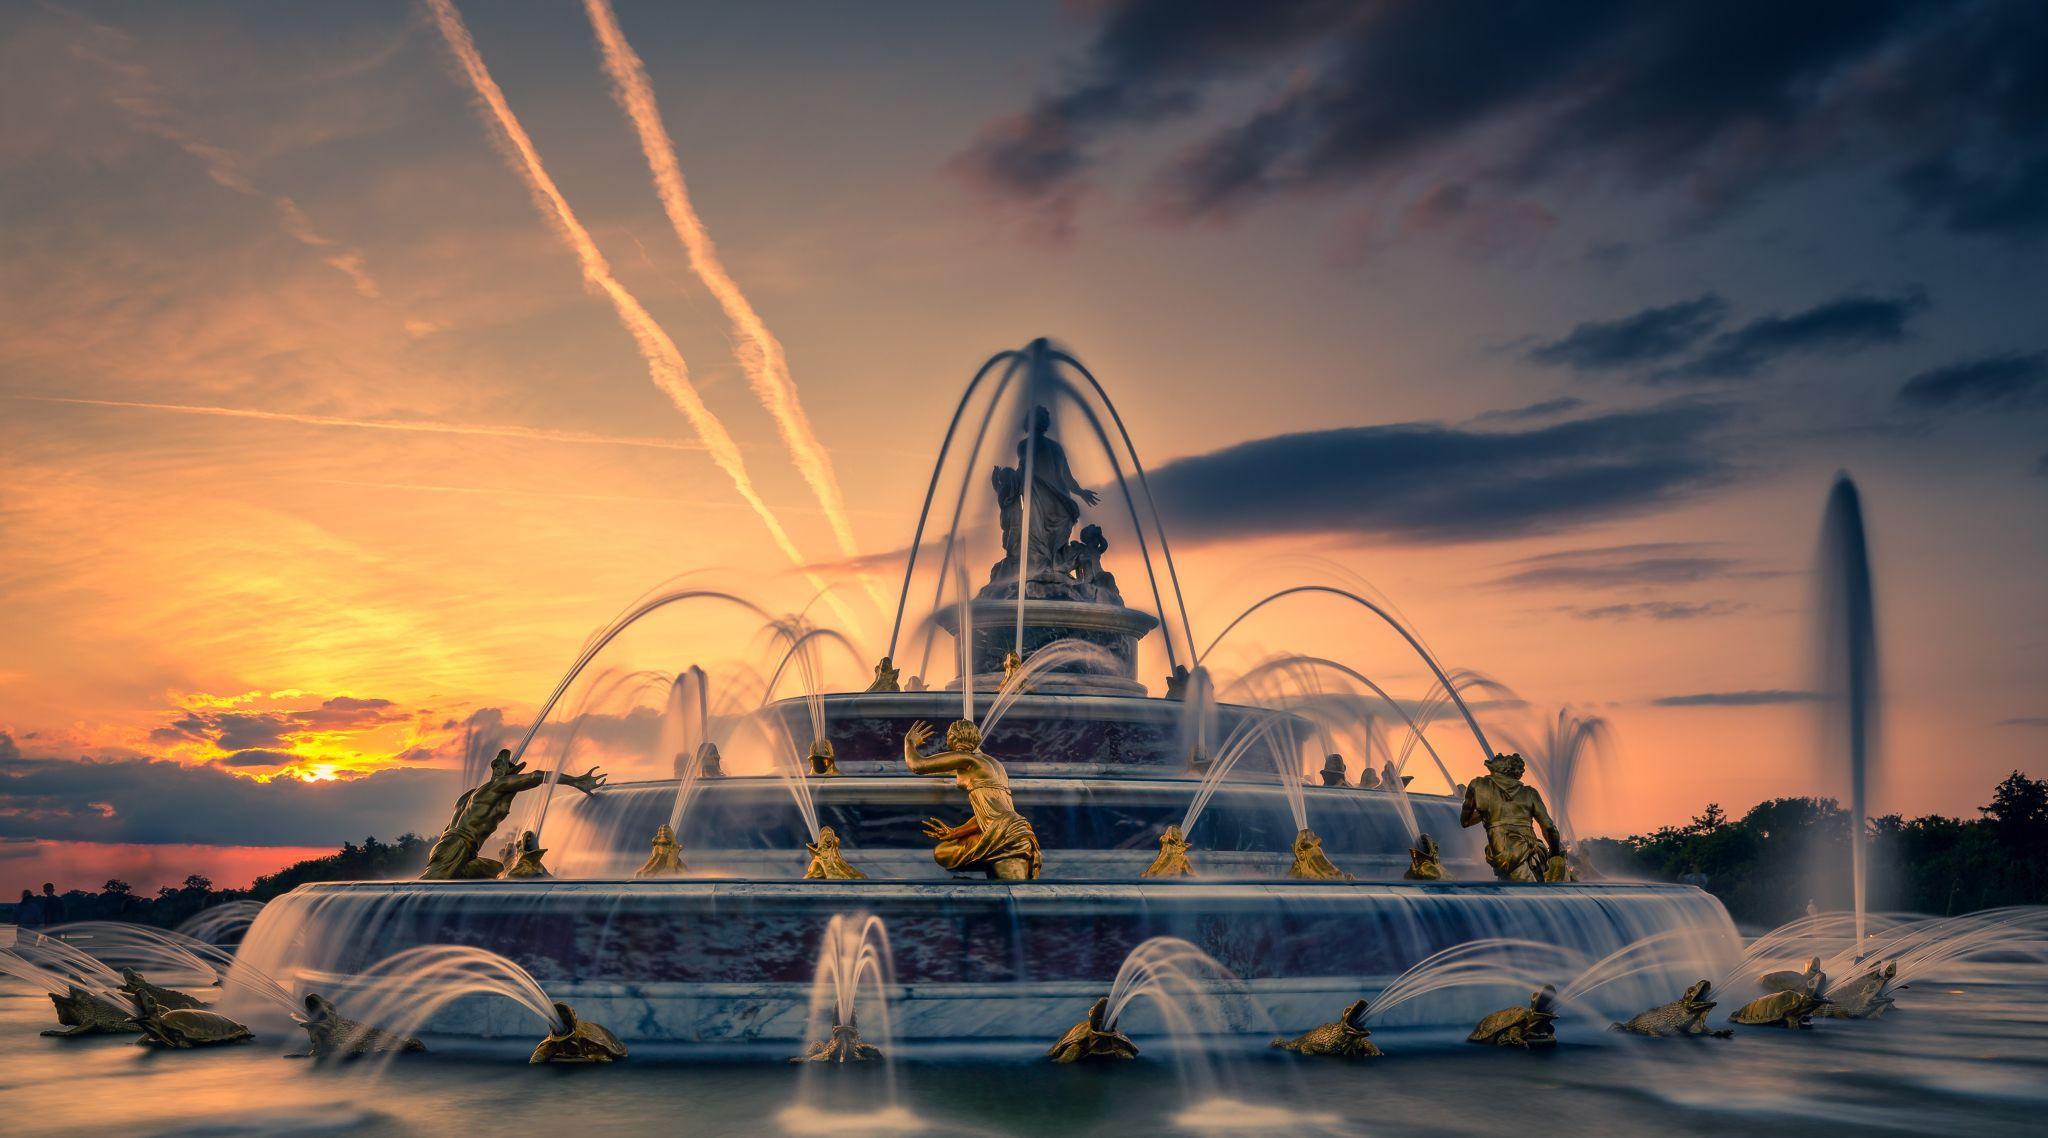 Versailles fountains, France